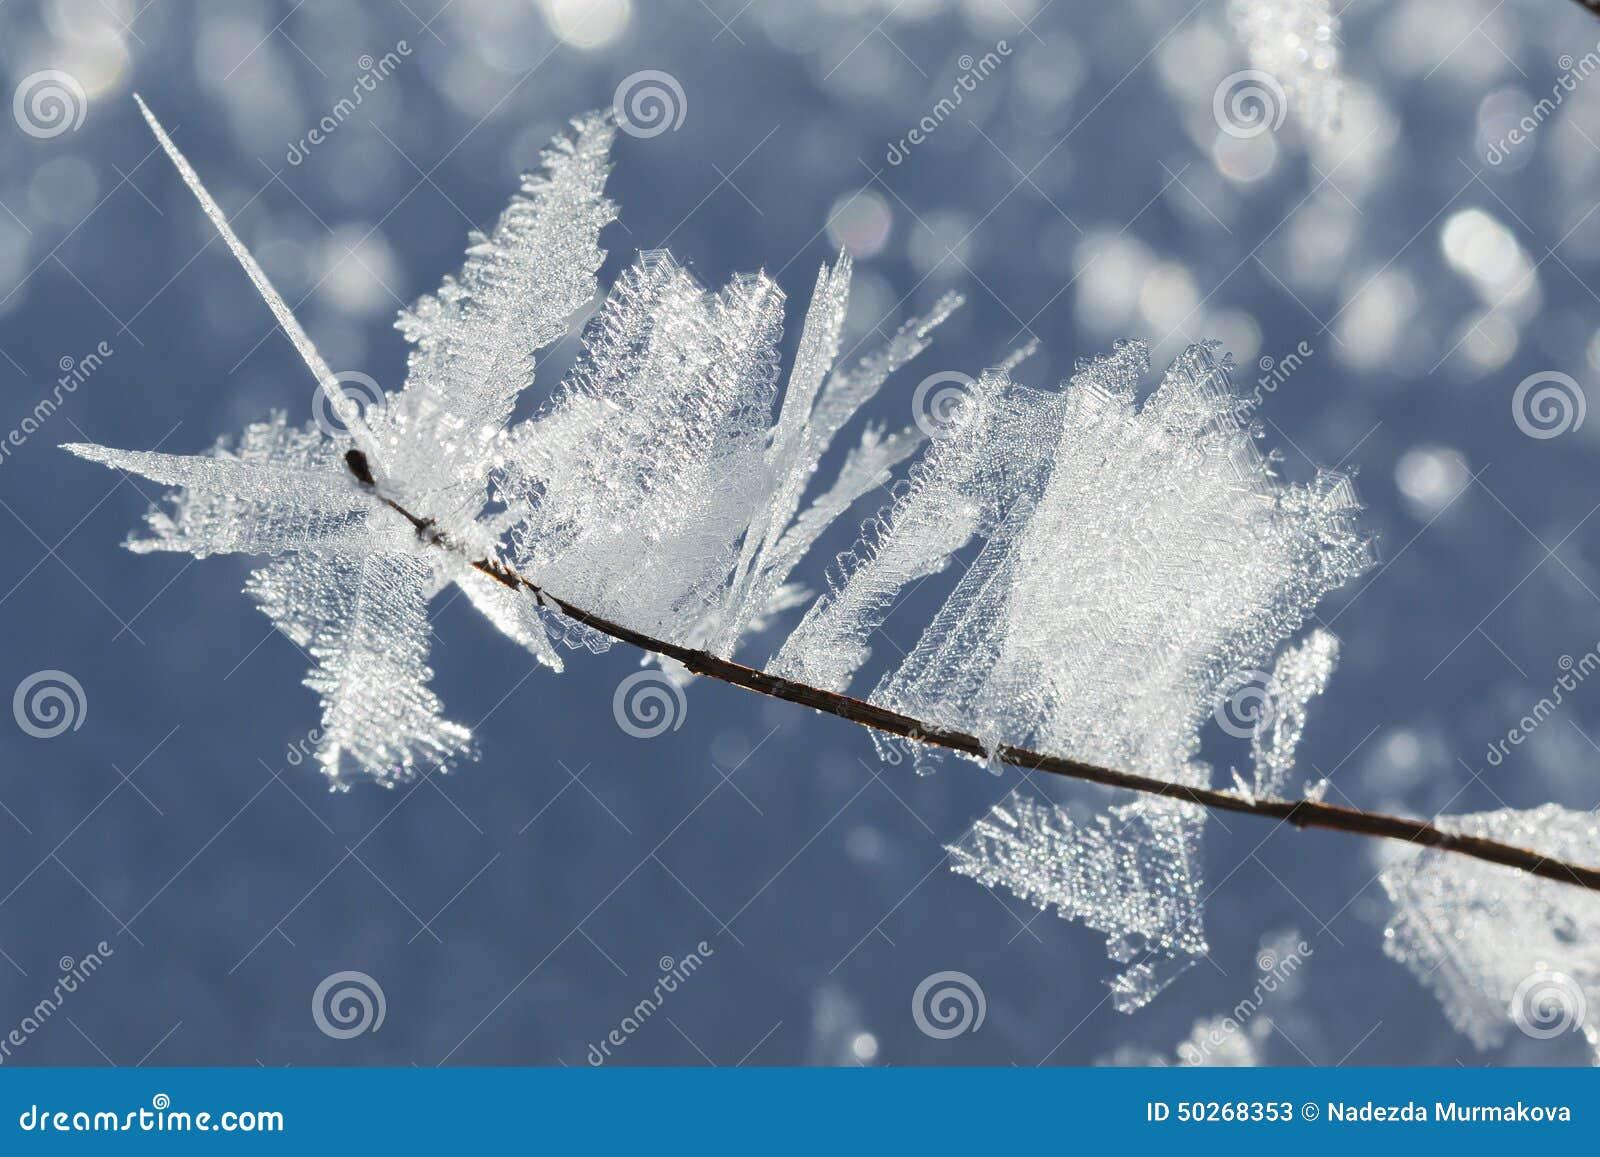 Crystal Icing macro en ramas